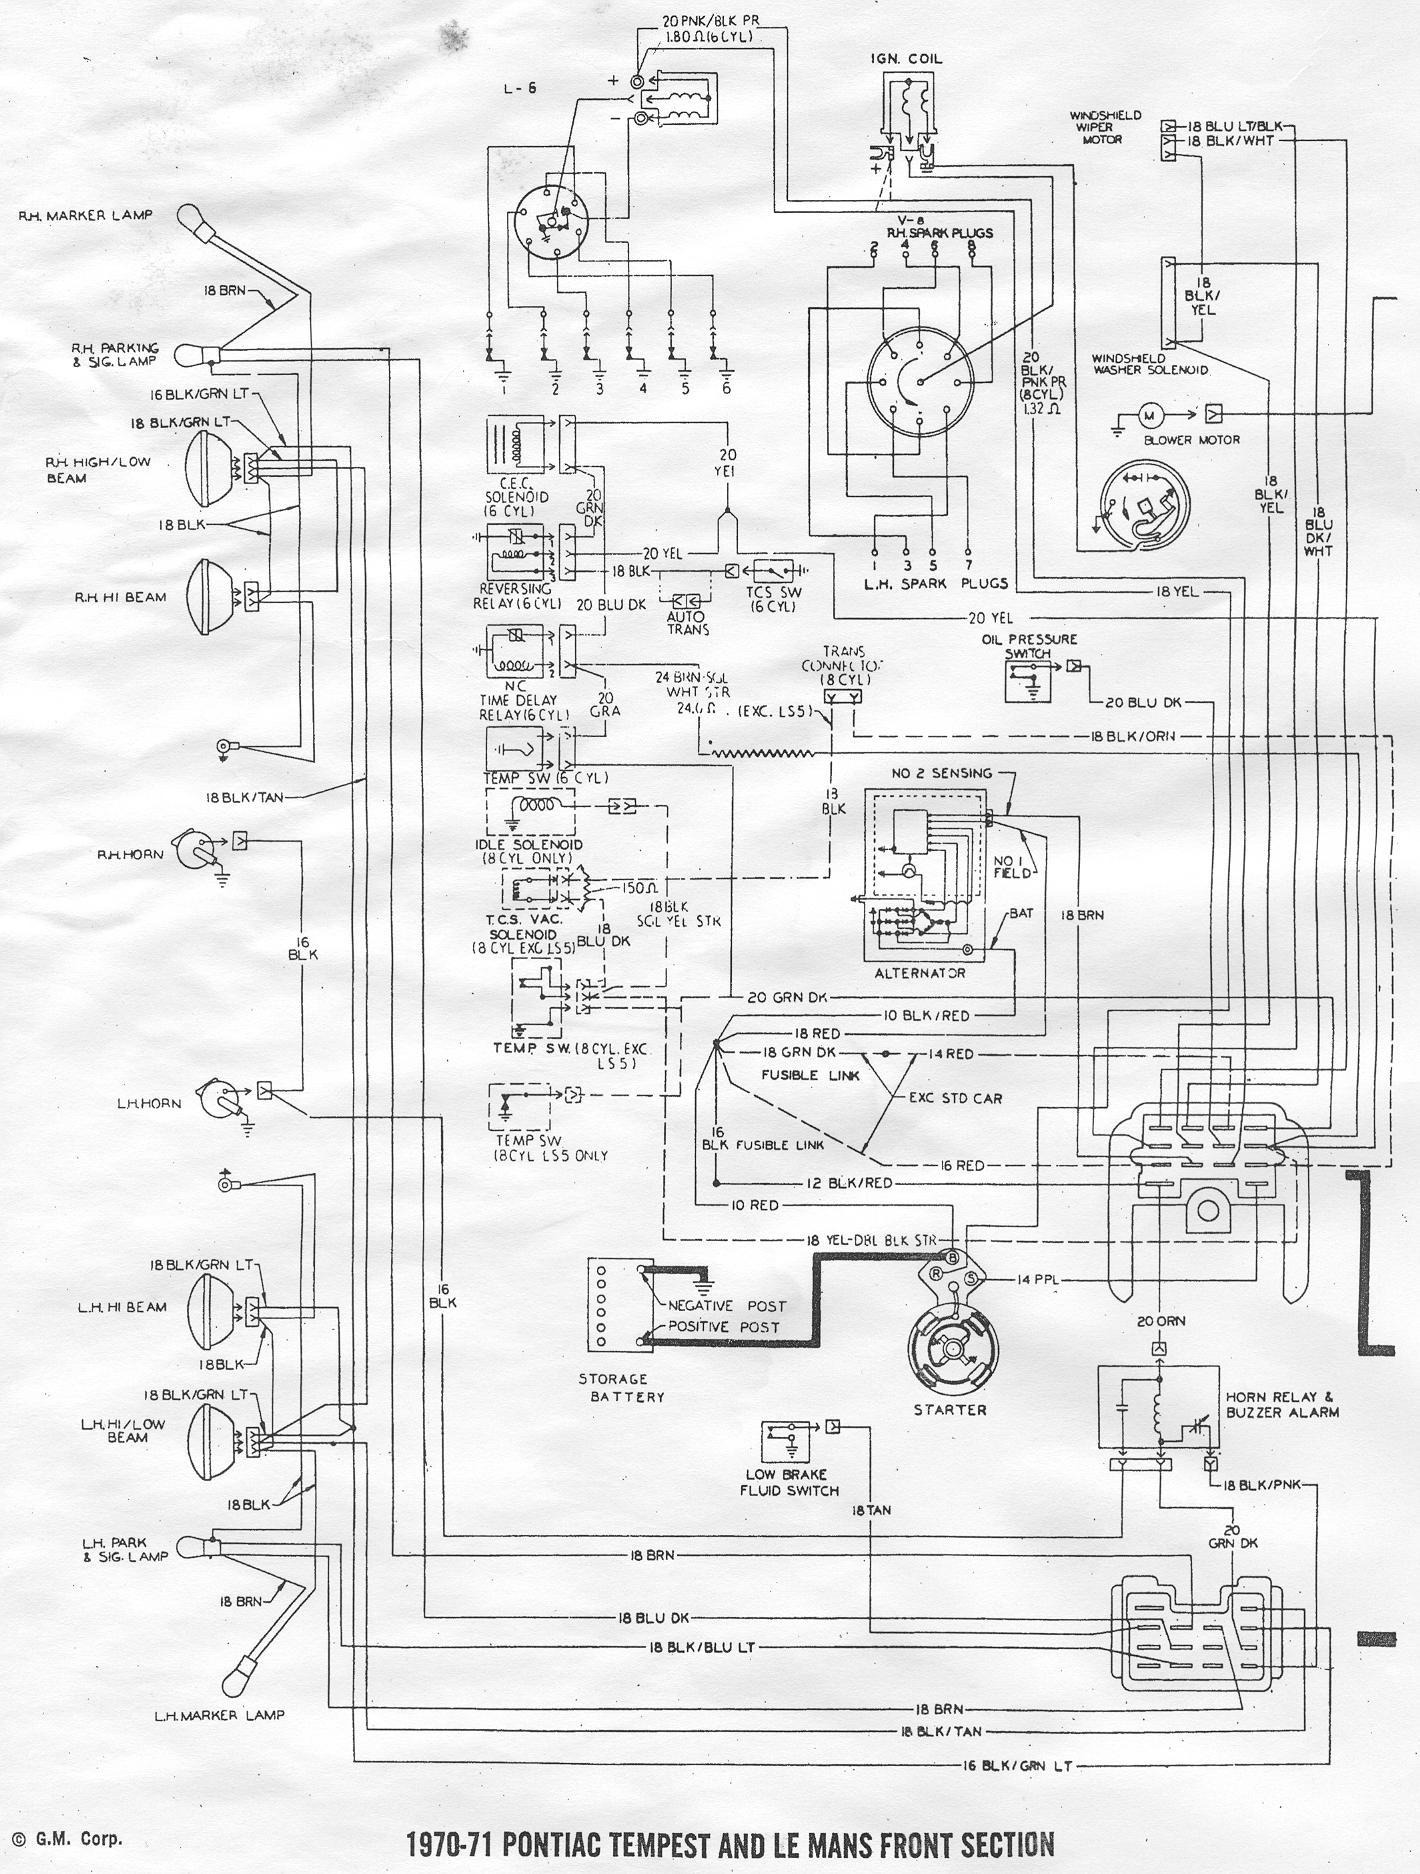 oldsmobile wiring diagram wiring diagrams